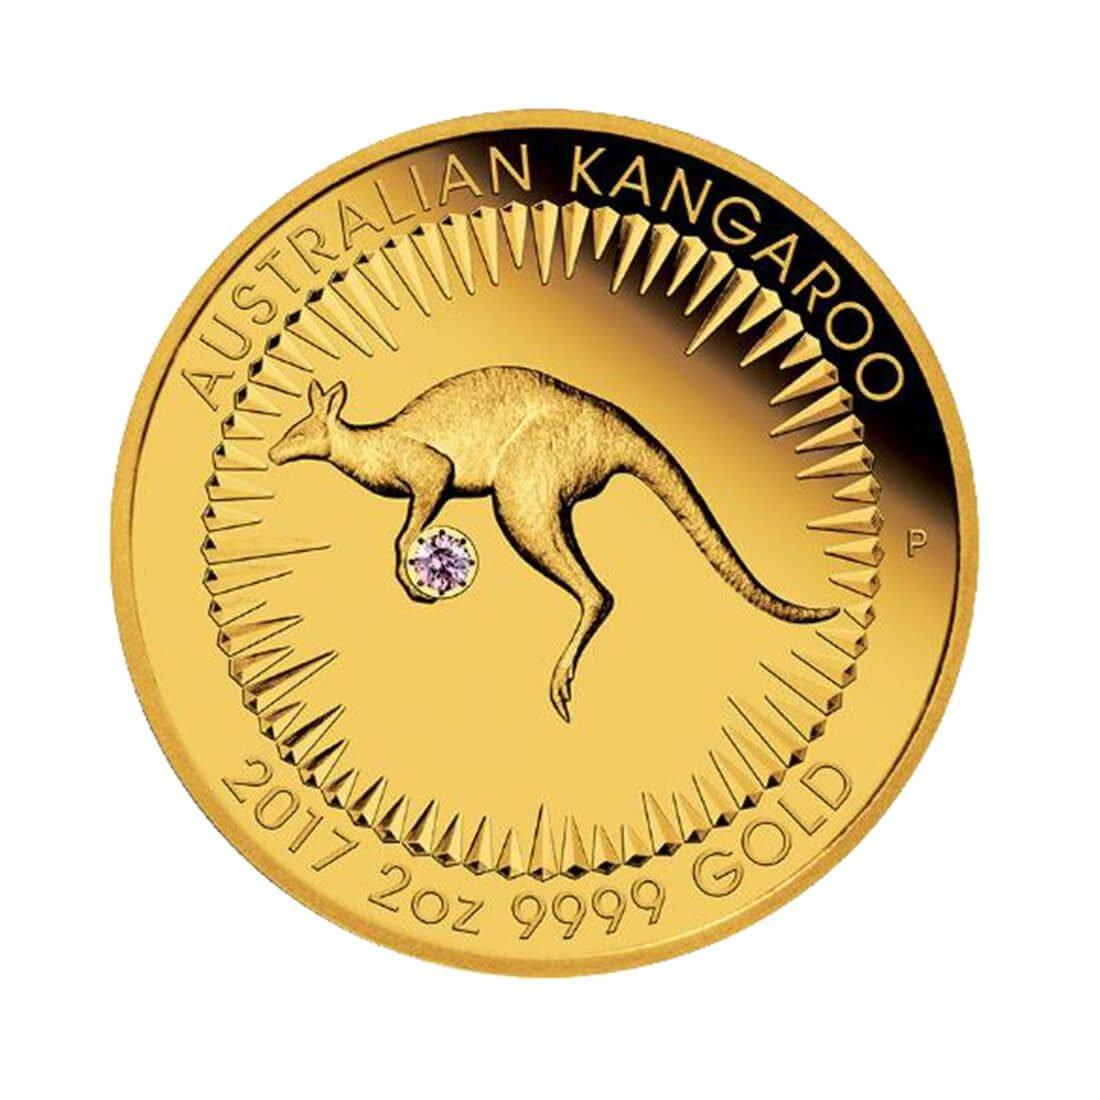 Limited Edition 2017 Australian Kangaroo Coin